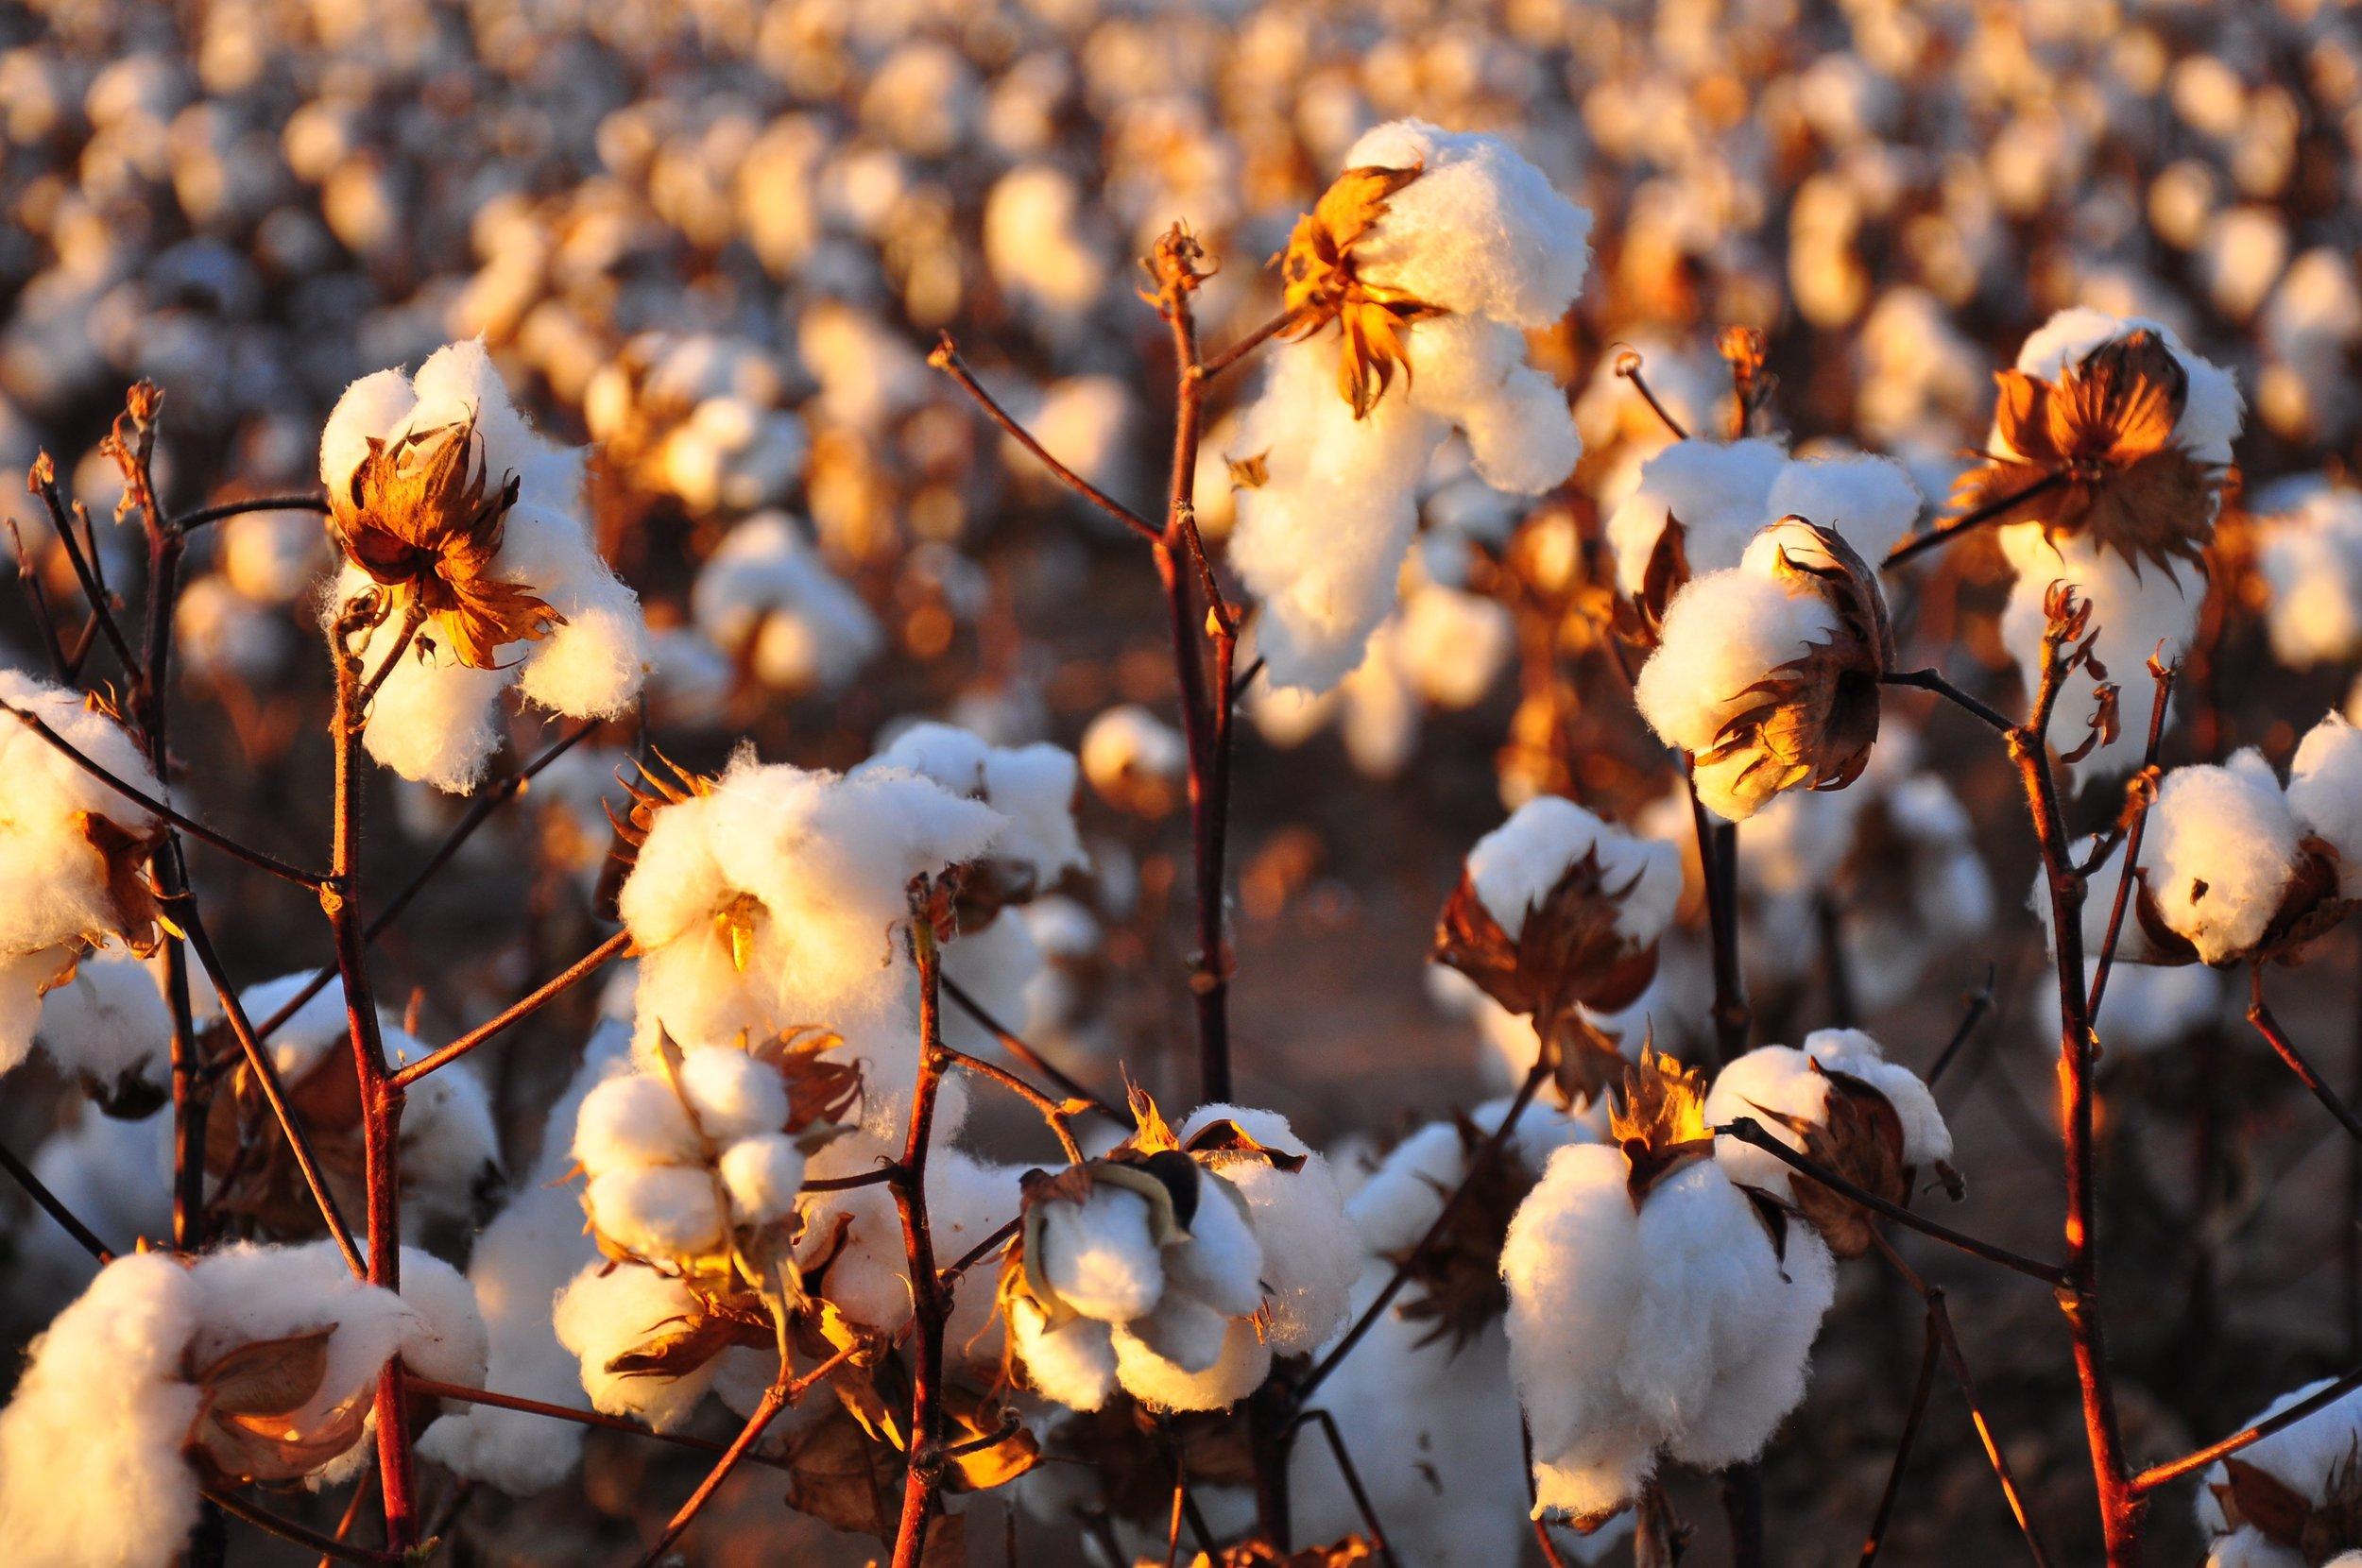 Cotton-Harvest_-Kimberly-Vardeman_Flikr.jpg